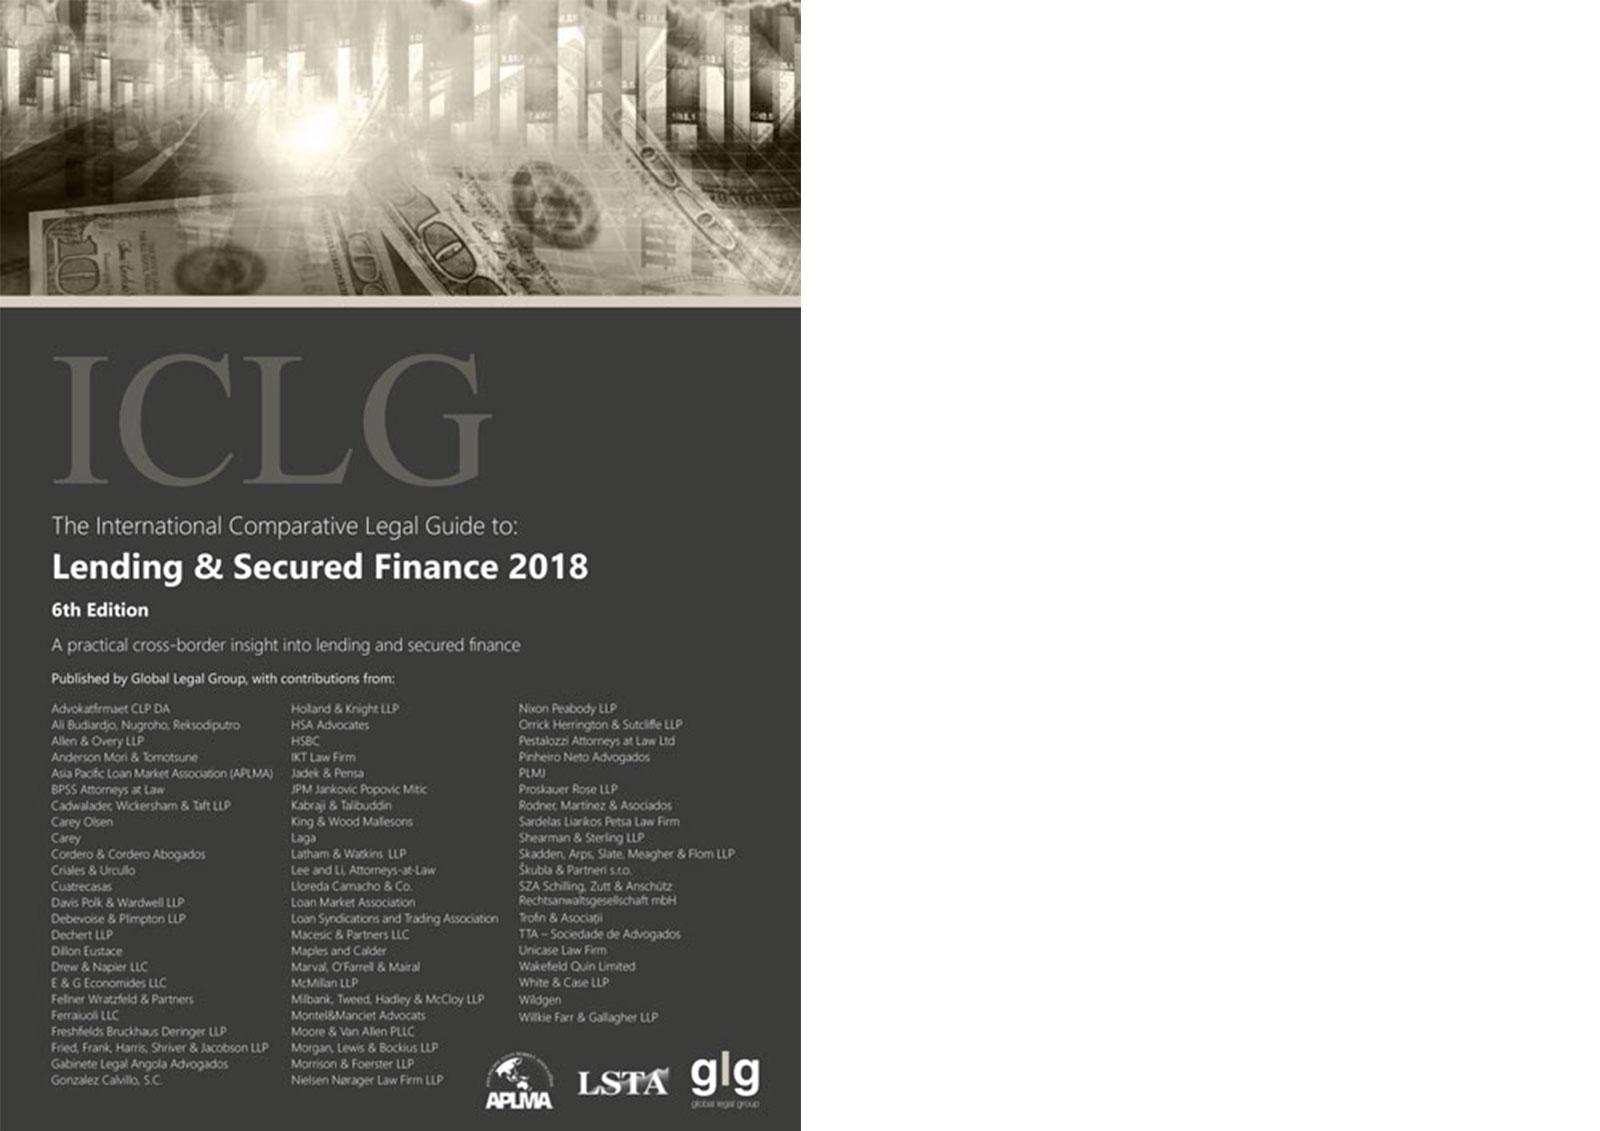 ICLG thumbnail